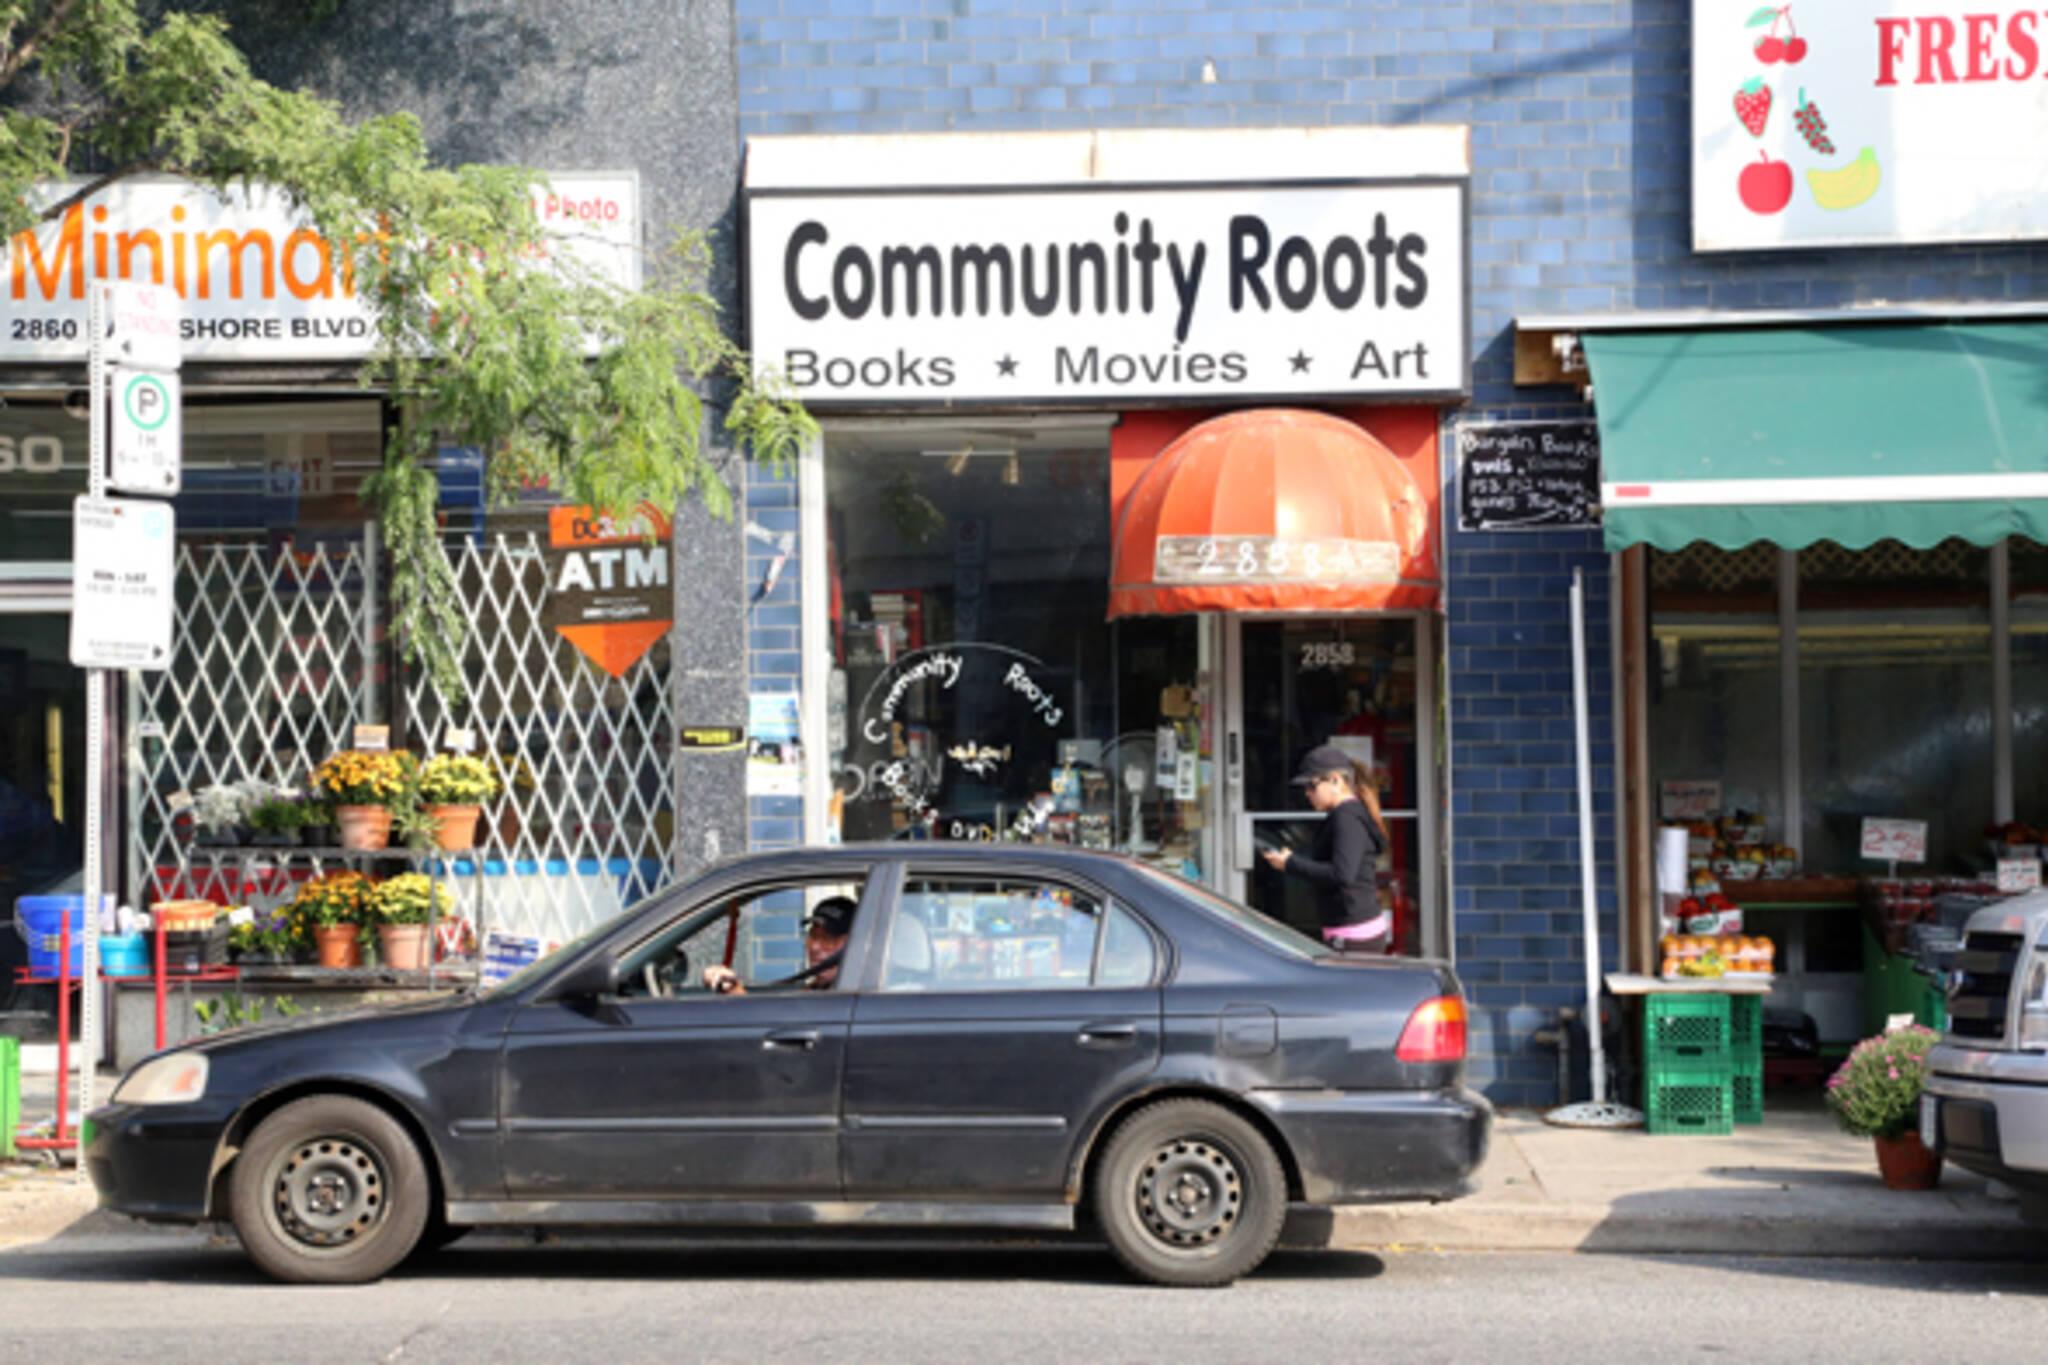 Community Roots Toronto